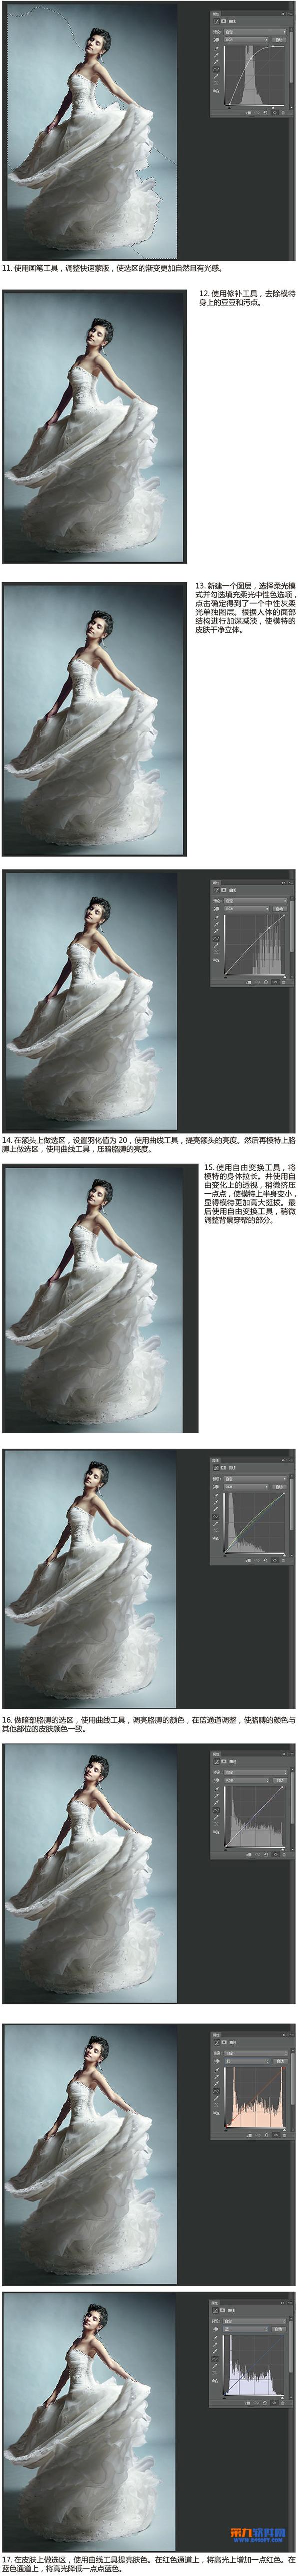 Photoshop如何调出影楼婚纱照图